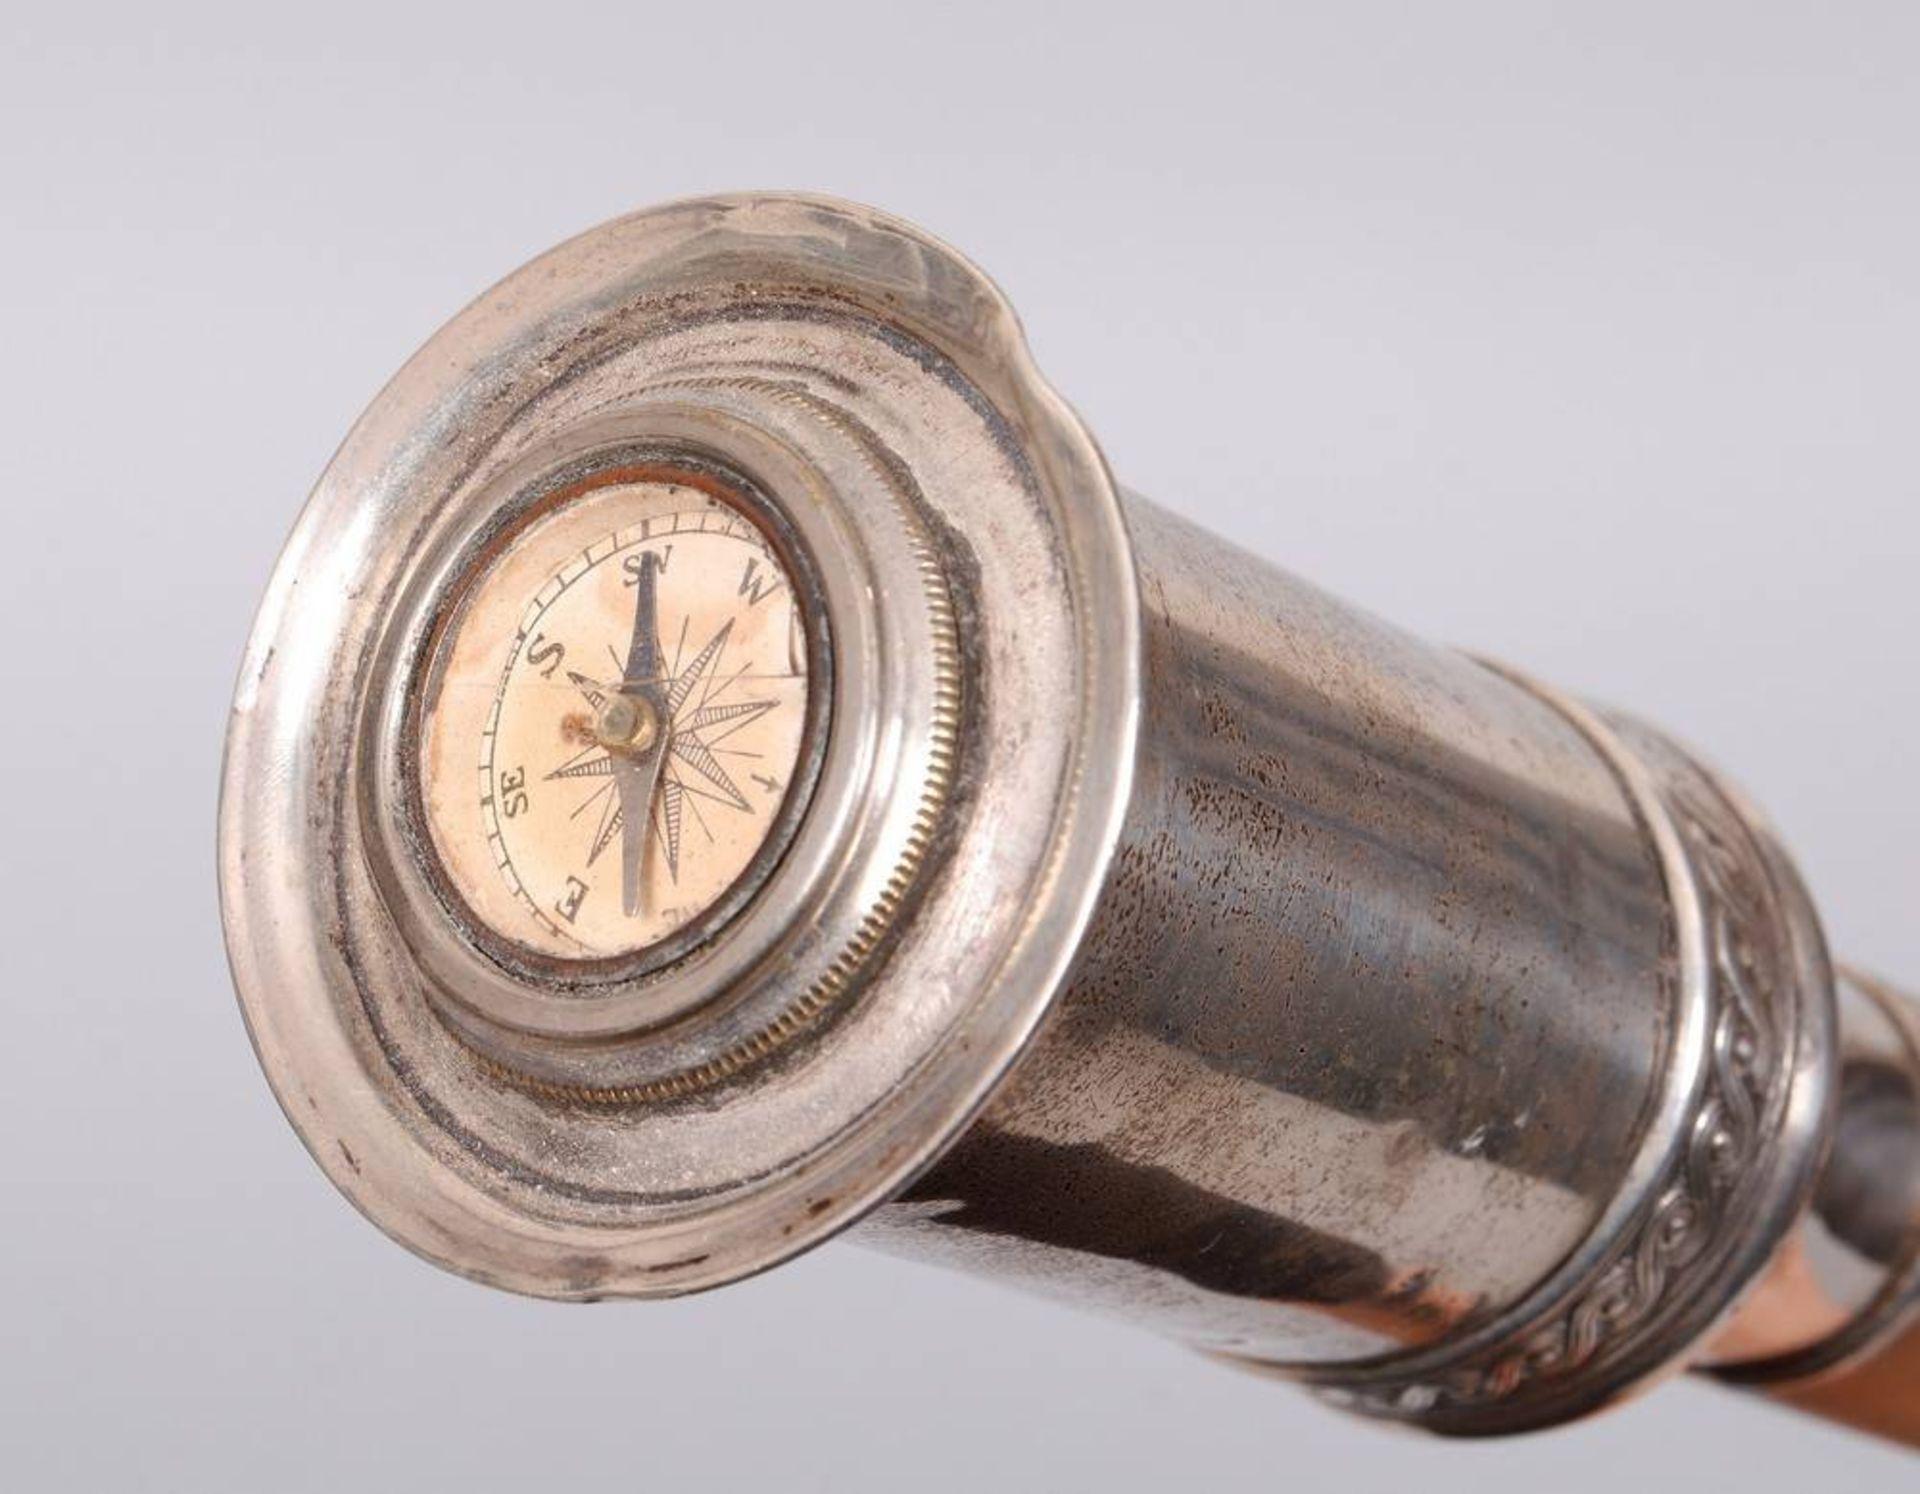 Gehstock mit Kompass, England, 19.Jh. - Bild 3 aus 3